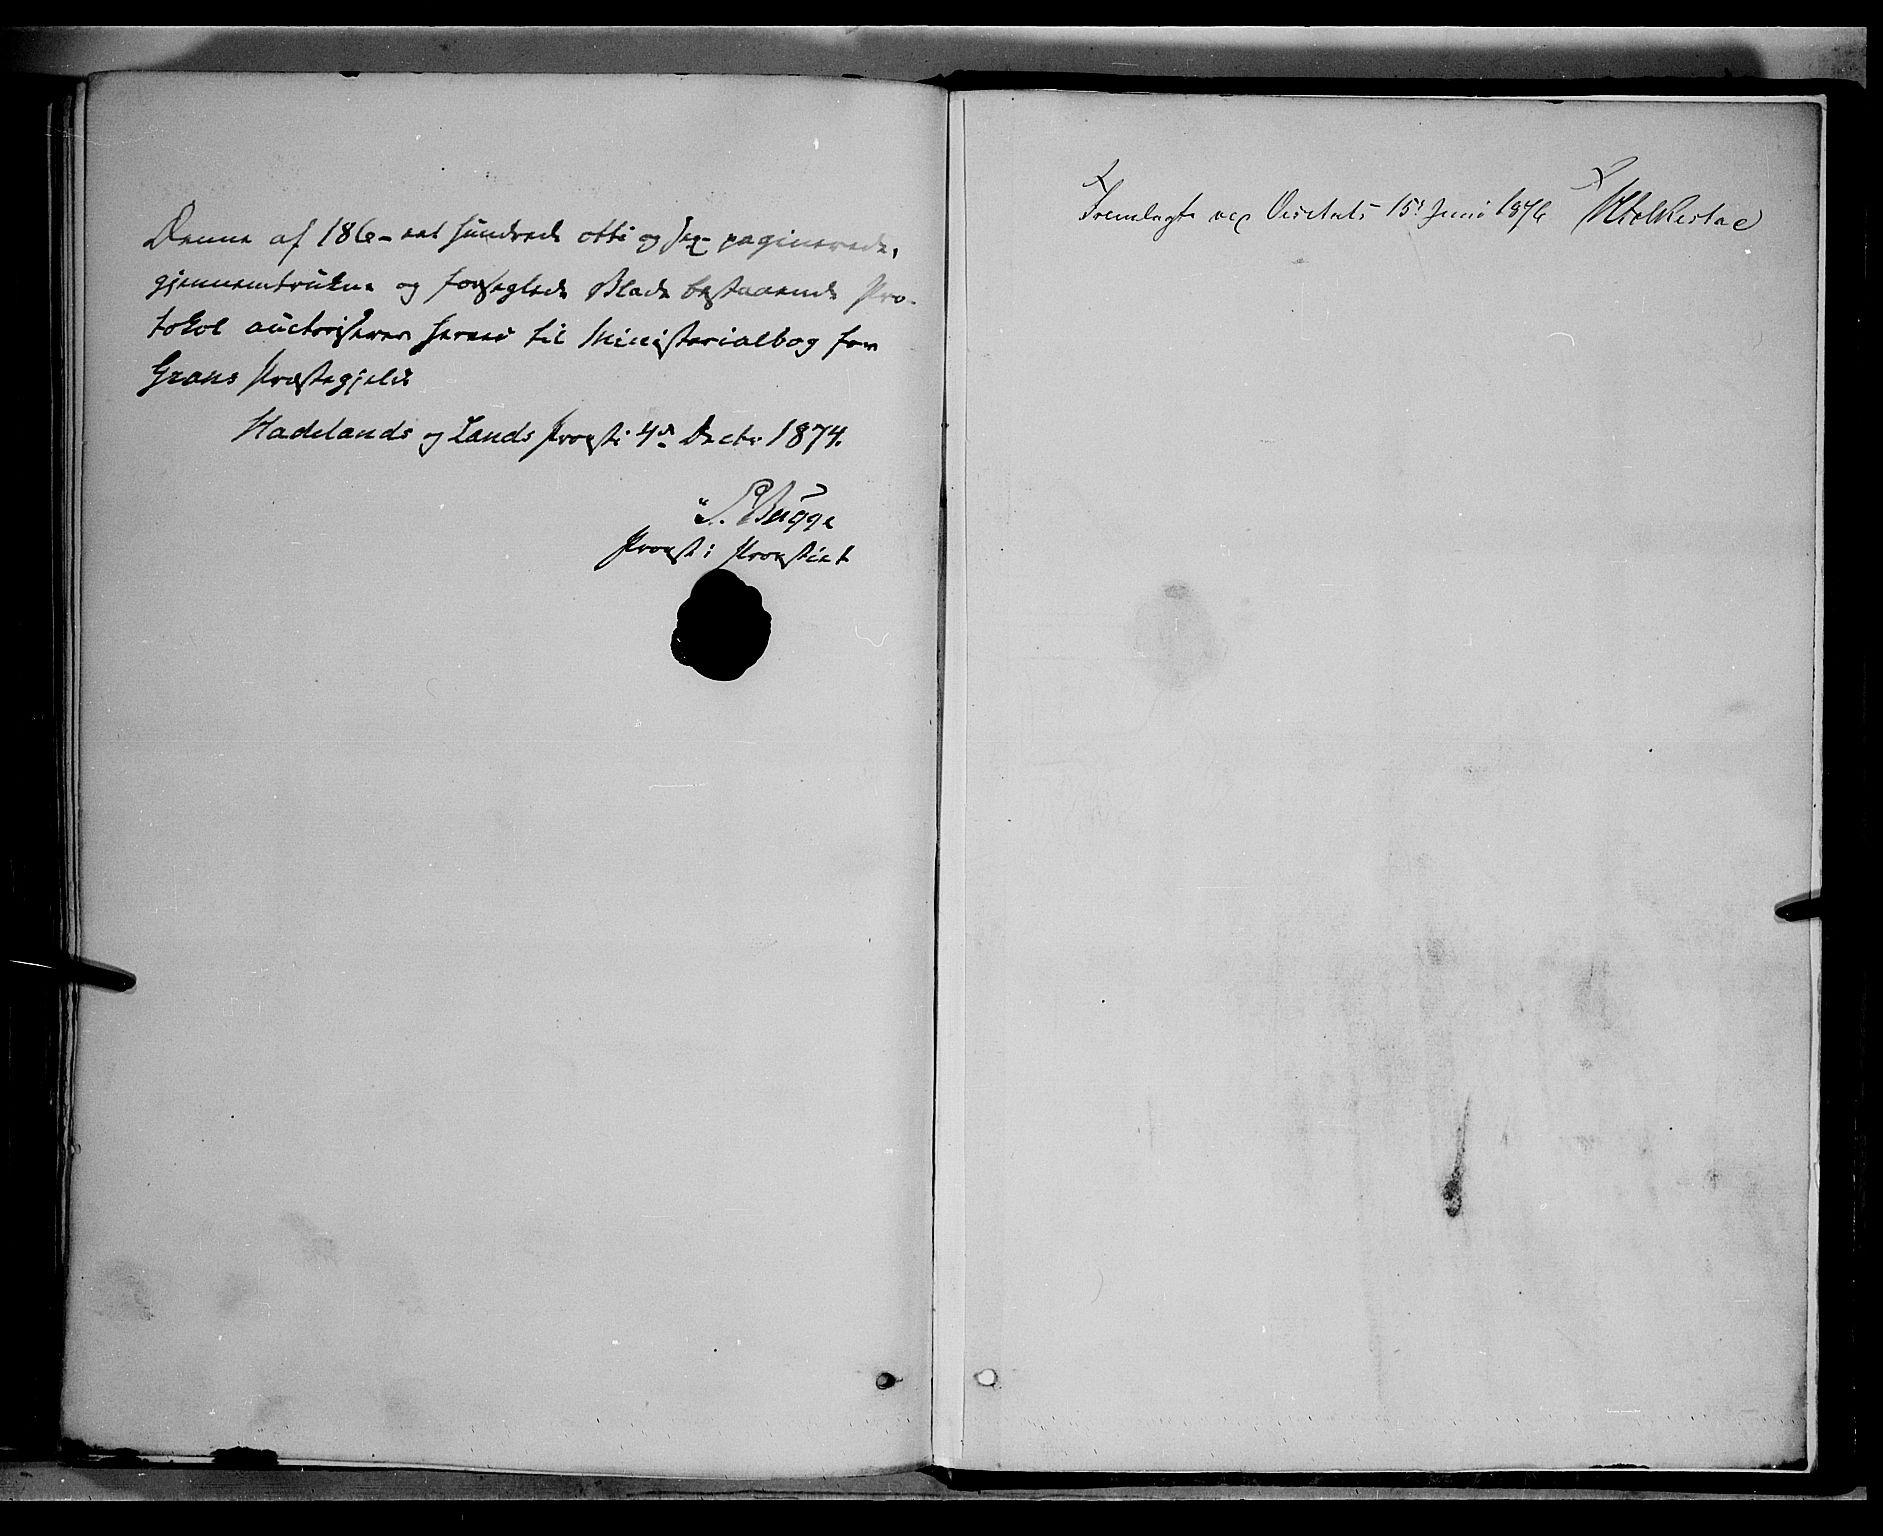 SAH, Gran prestekontor, Ministerialbok nr. 13, 1875-1879